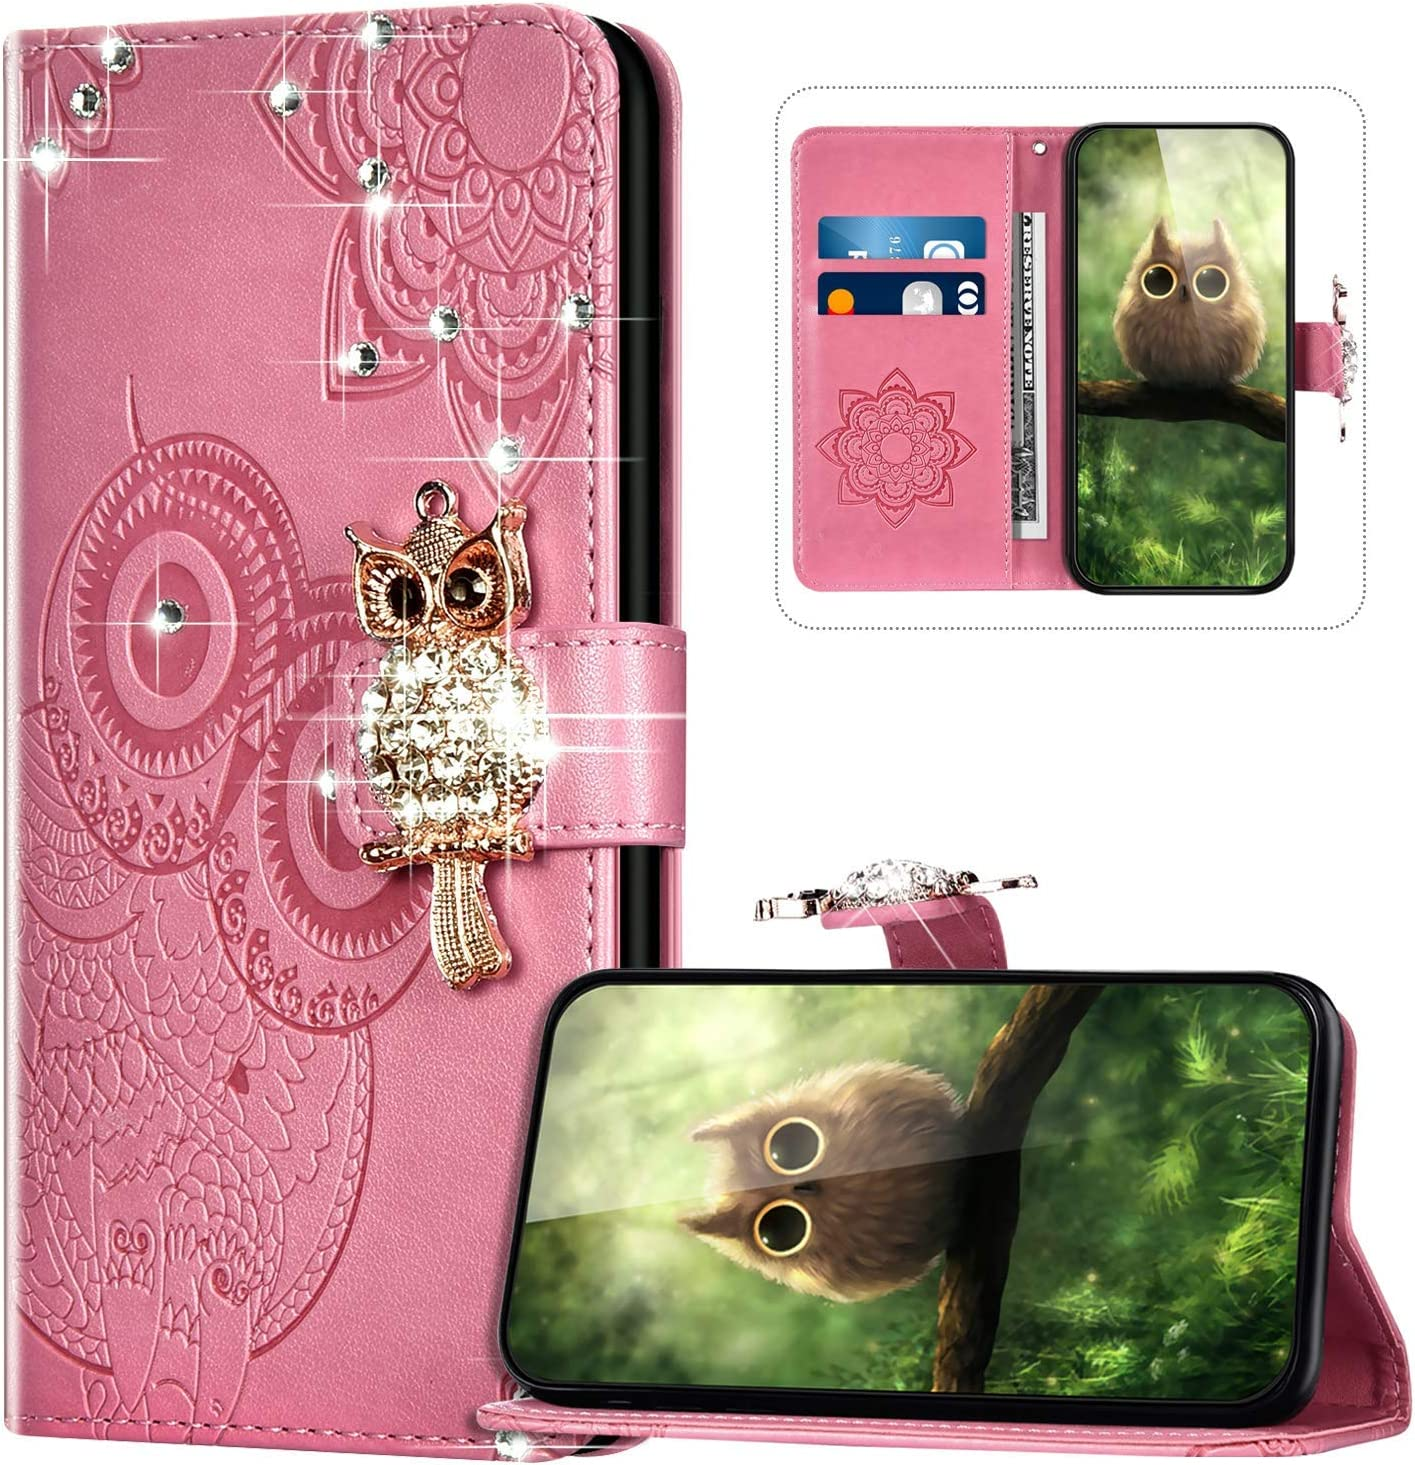 Handyh/ülle f/ür Samsung Galaxy M31 H/ülle Leder,Galaxy M31 Klapph/ülle Handytasche Bling Glitzer Diamant Eule Muster Tasche Leder Flip Case Lederh/ülle Magnetisch Wallet Schutzh/ülle,Rosa